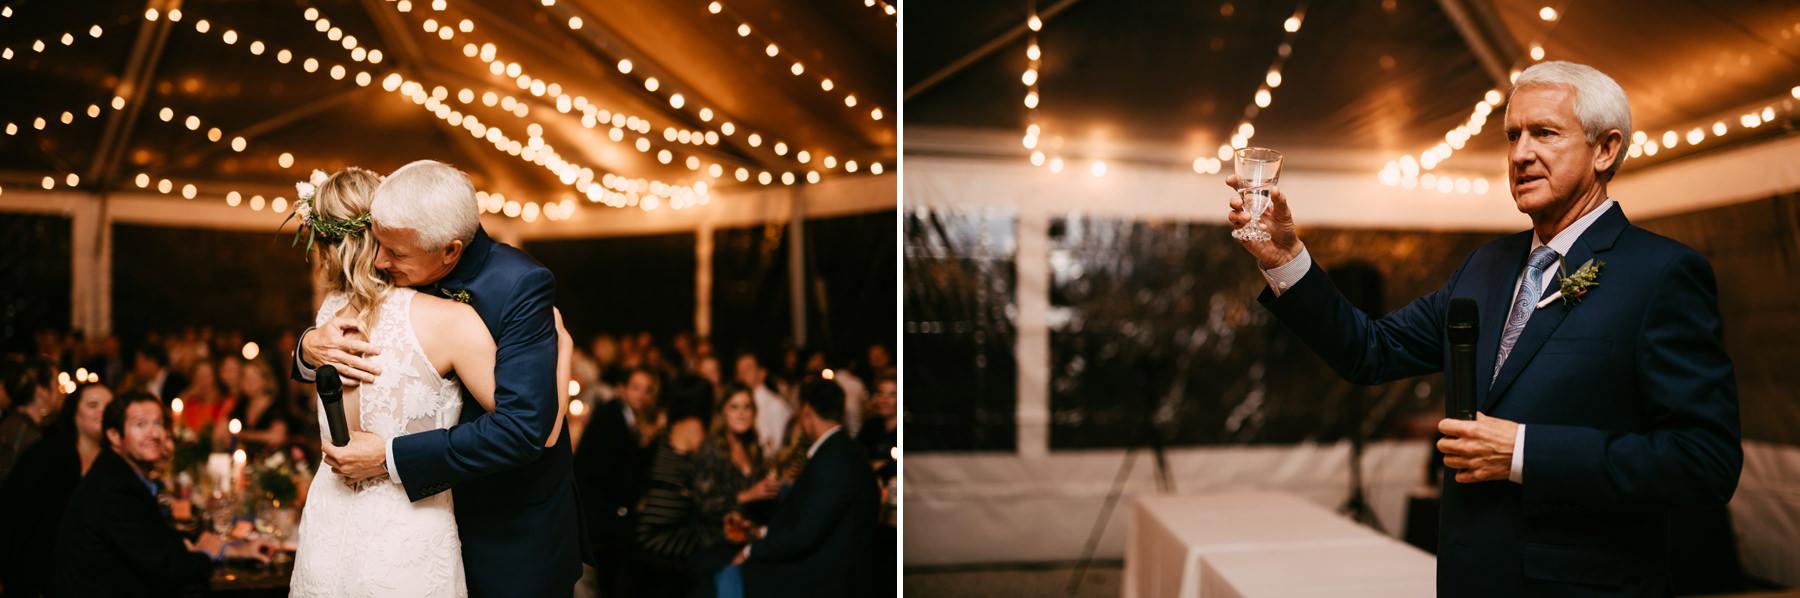 382-colorful-outdoor-lopez-island-wedding.jpg